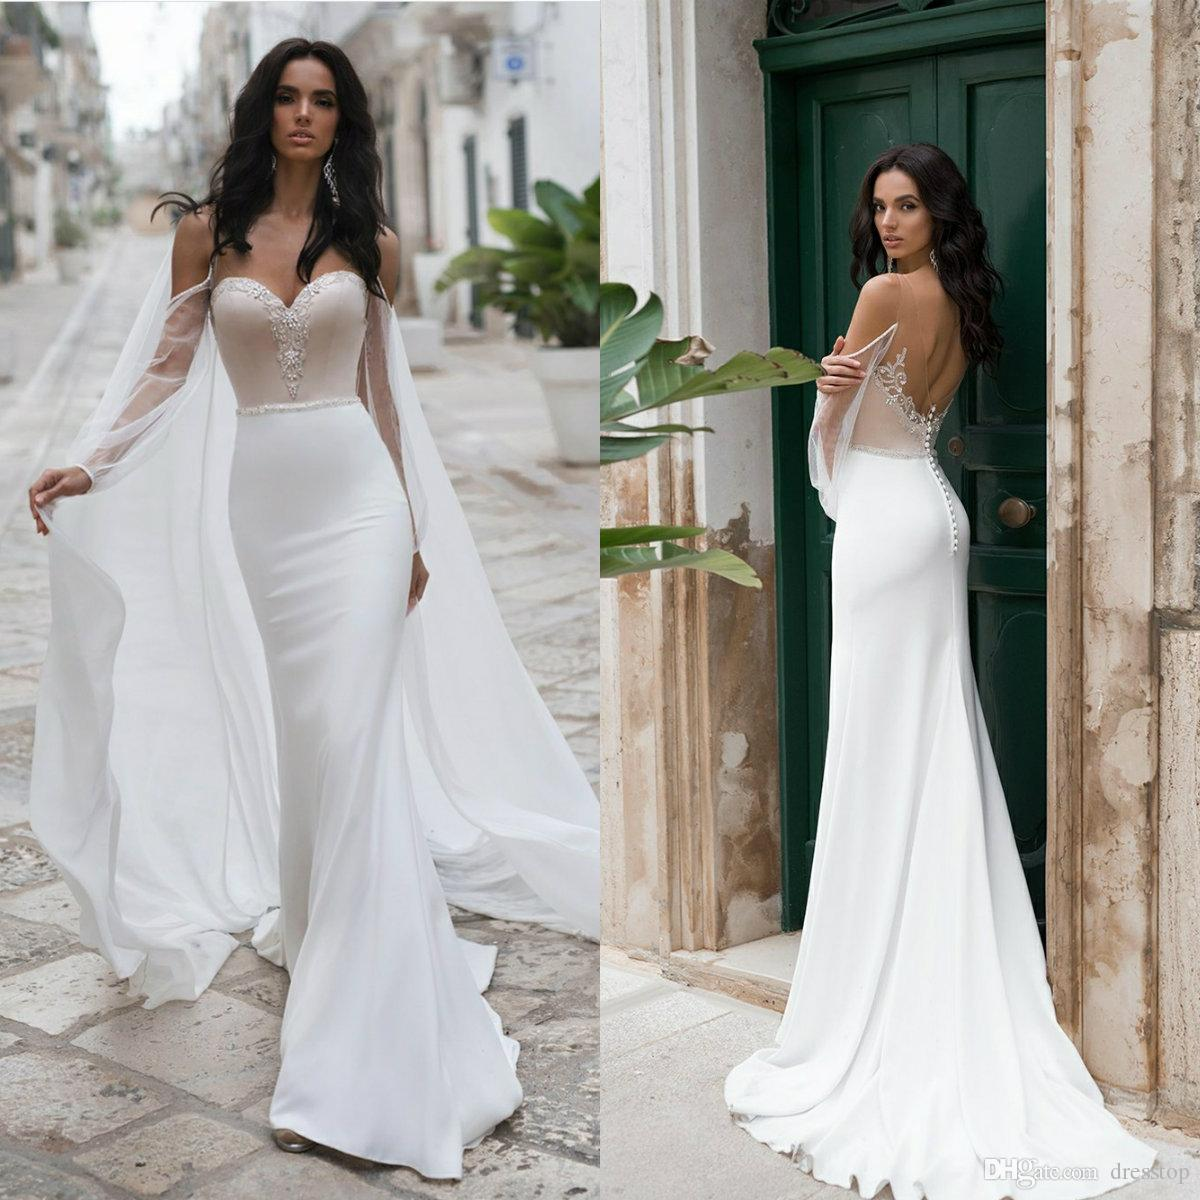 Sweetheart Beach Mermaid Wedding Dresses with Wrap Lace Beaded Bohemian Wedding Gowns Buttons Back Sweep Train Sexy vestido de novia